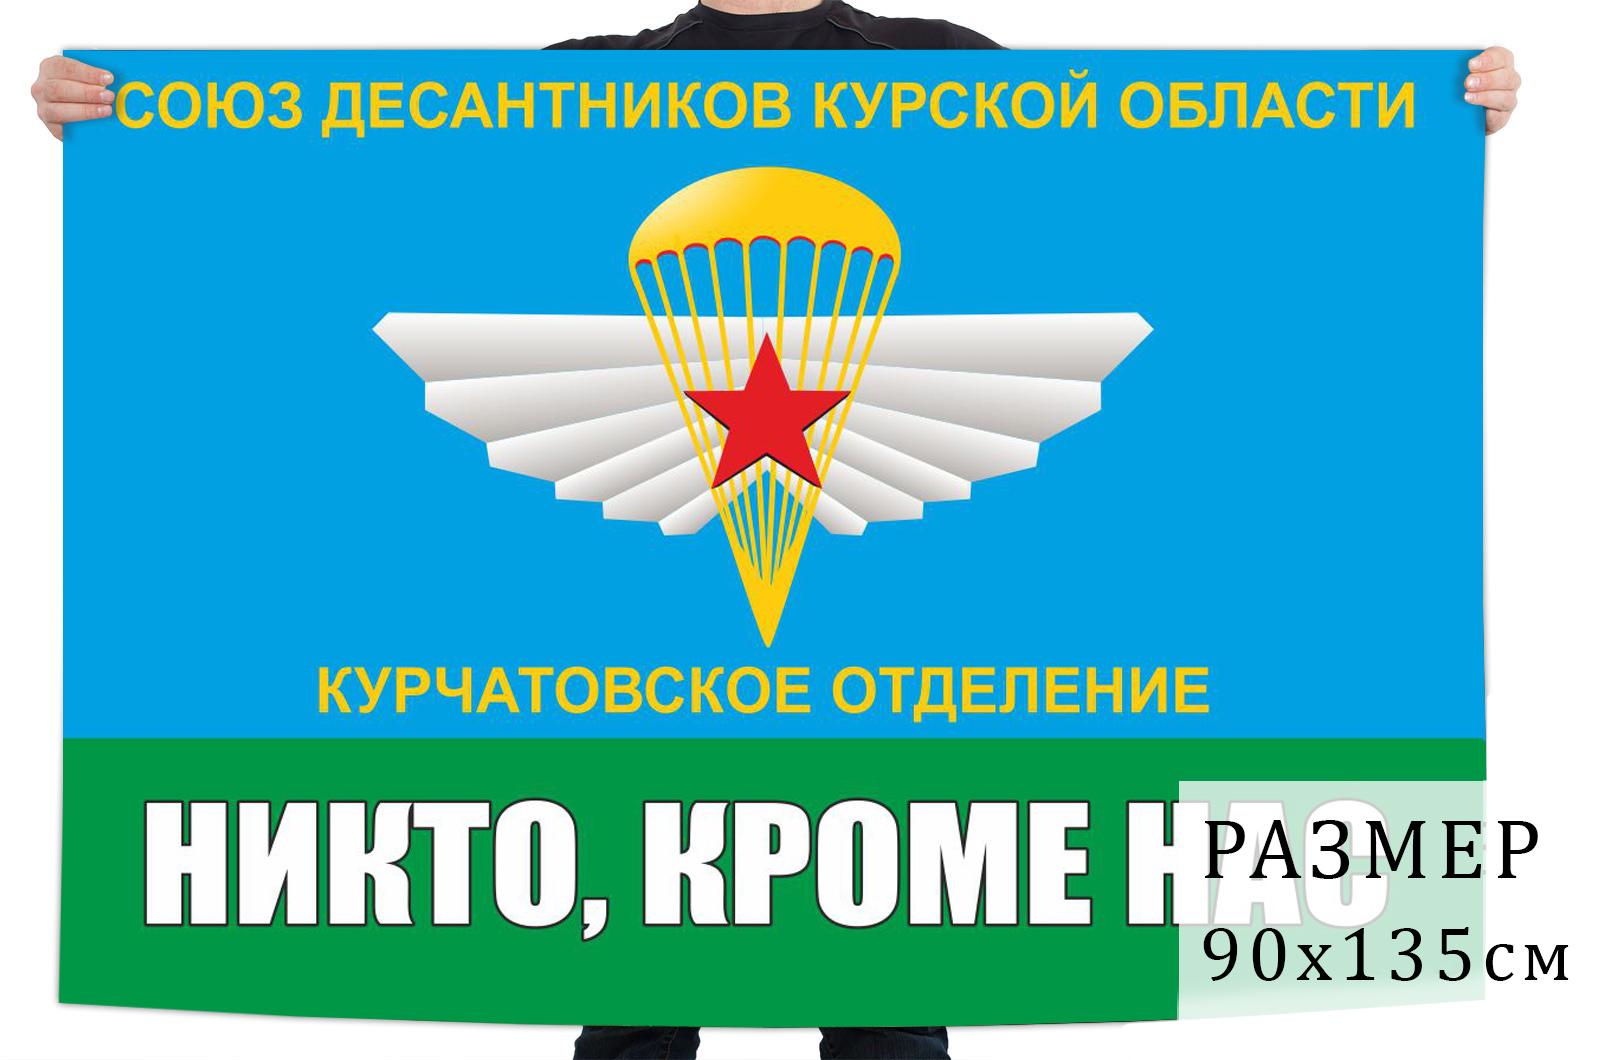 Флаг Союза десантников Курской области